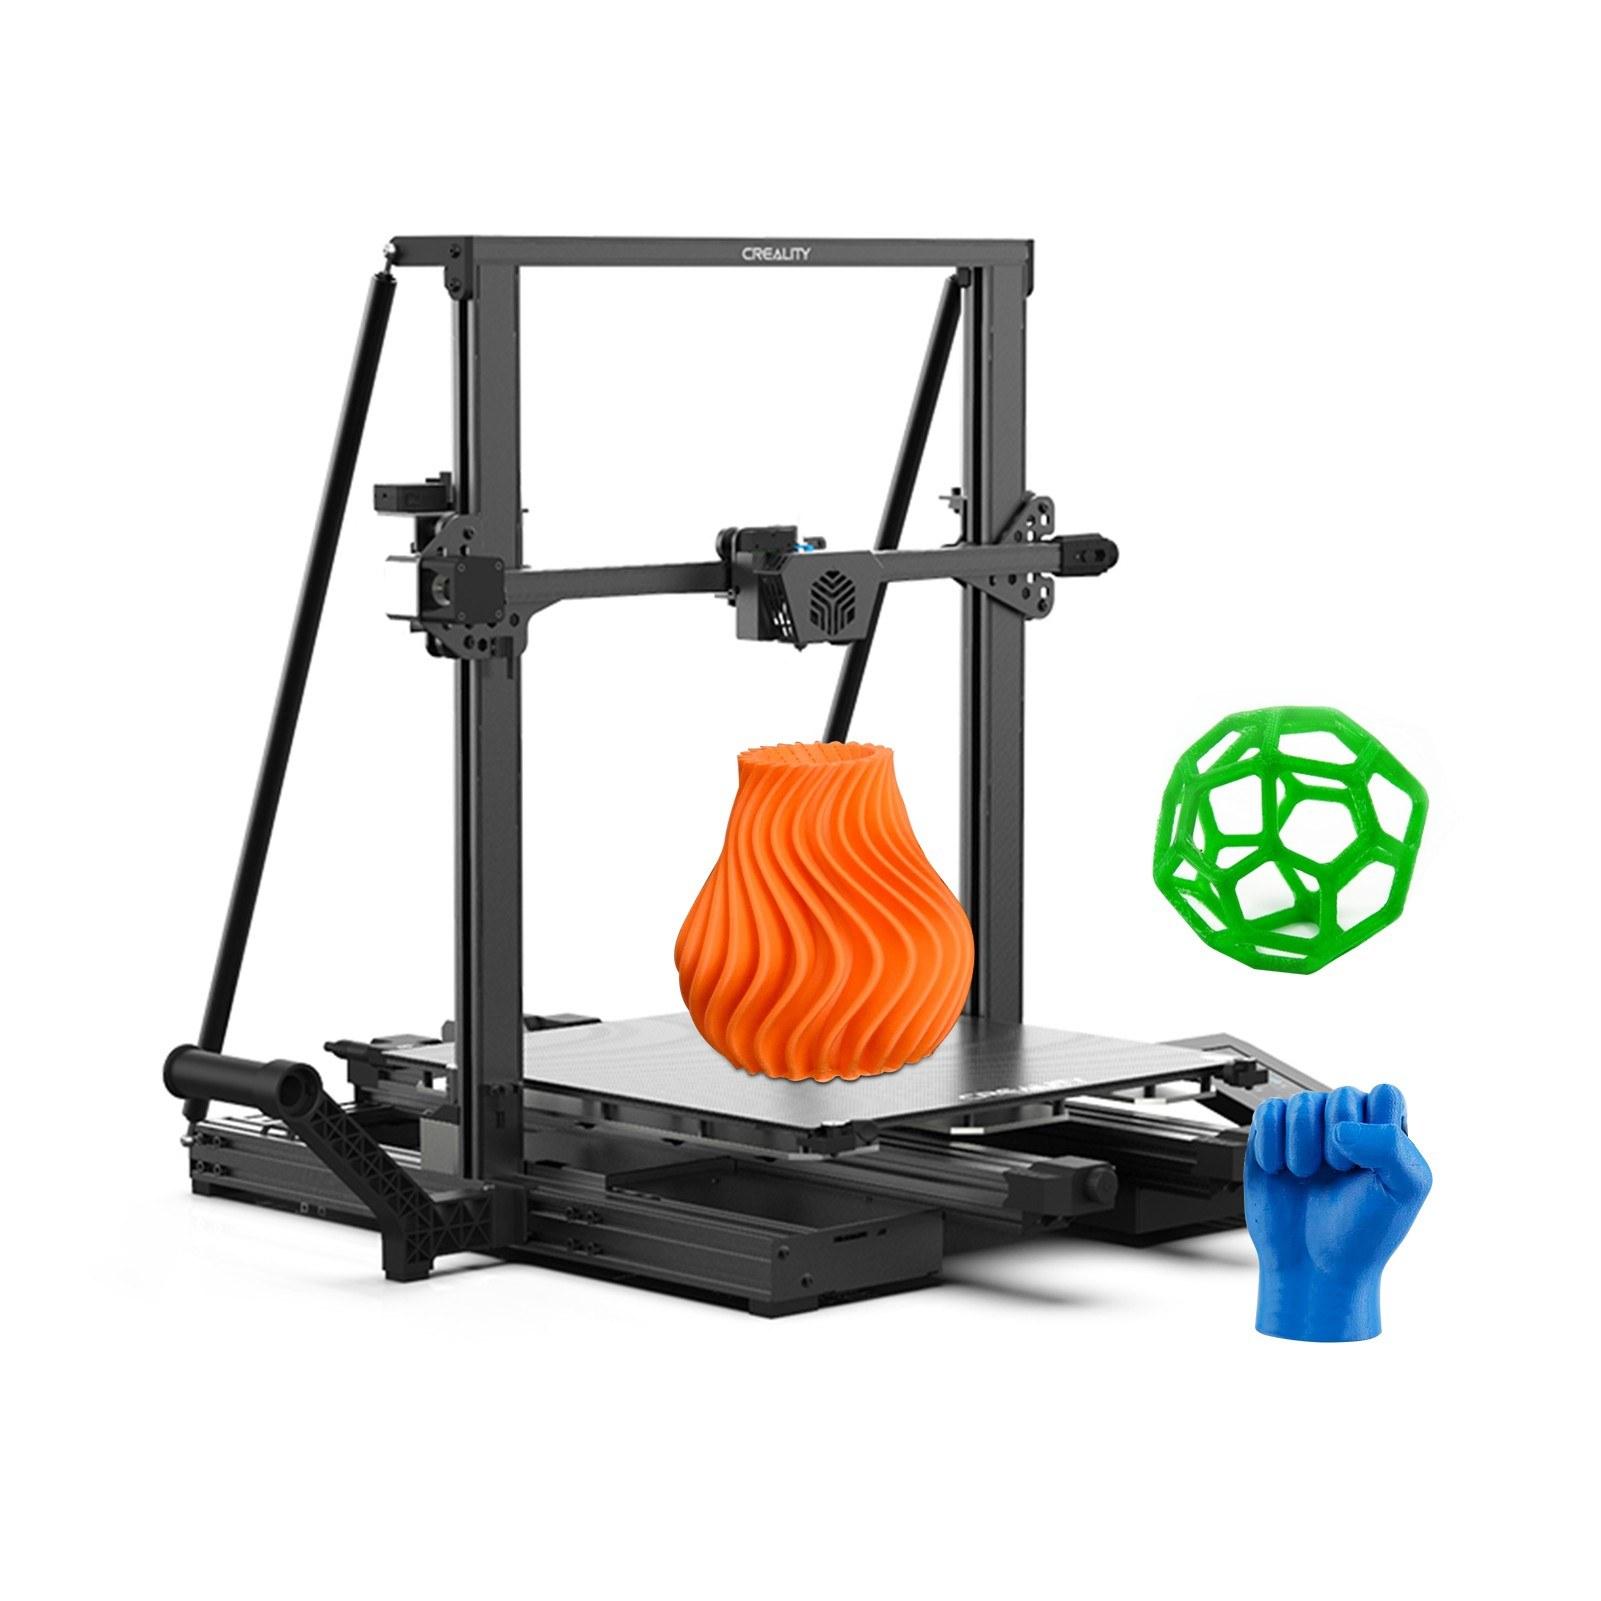 Tomtop - [EU Warehouse] $140 OFF Original Creality CR-6 Max High Precision 3D Printer, Free Shipping $729